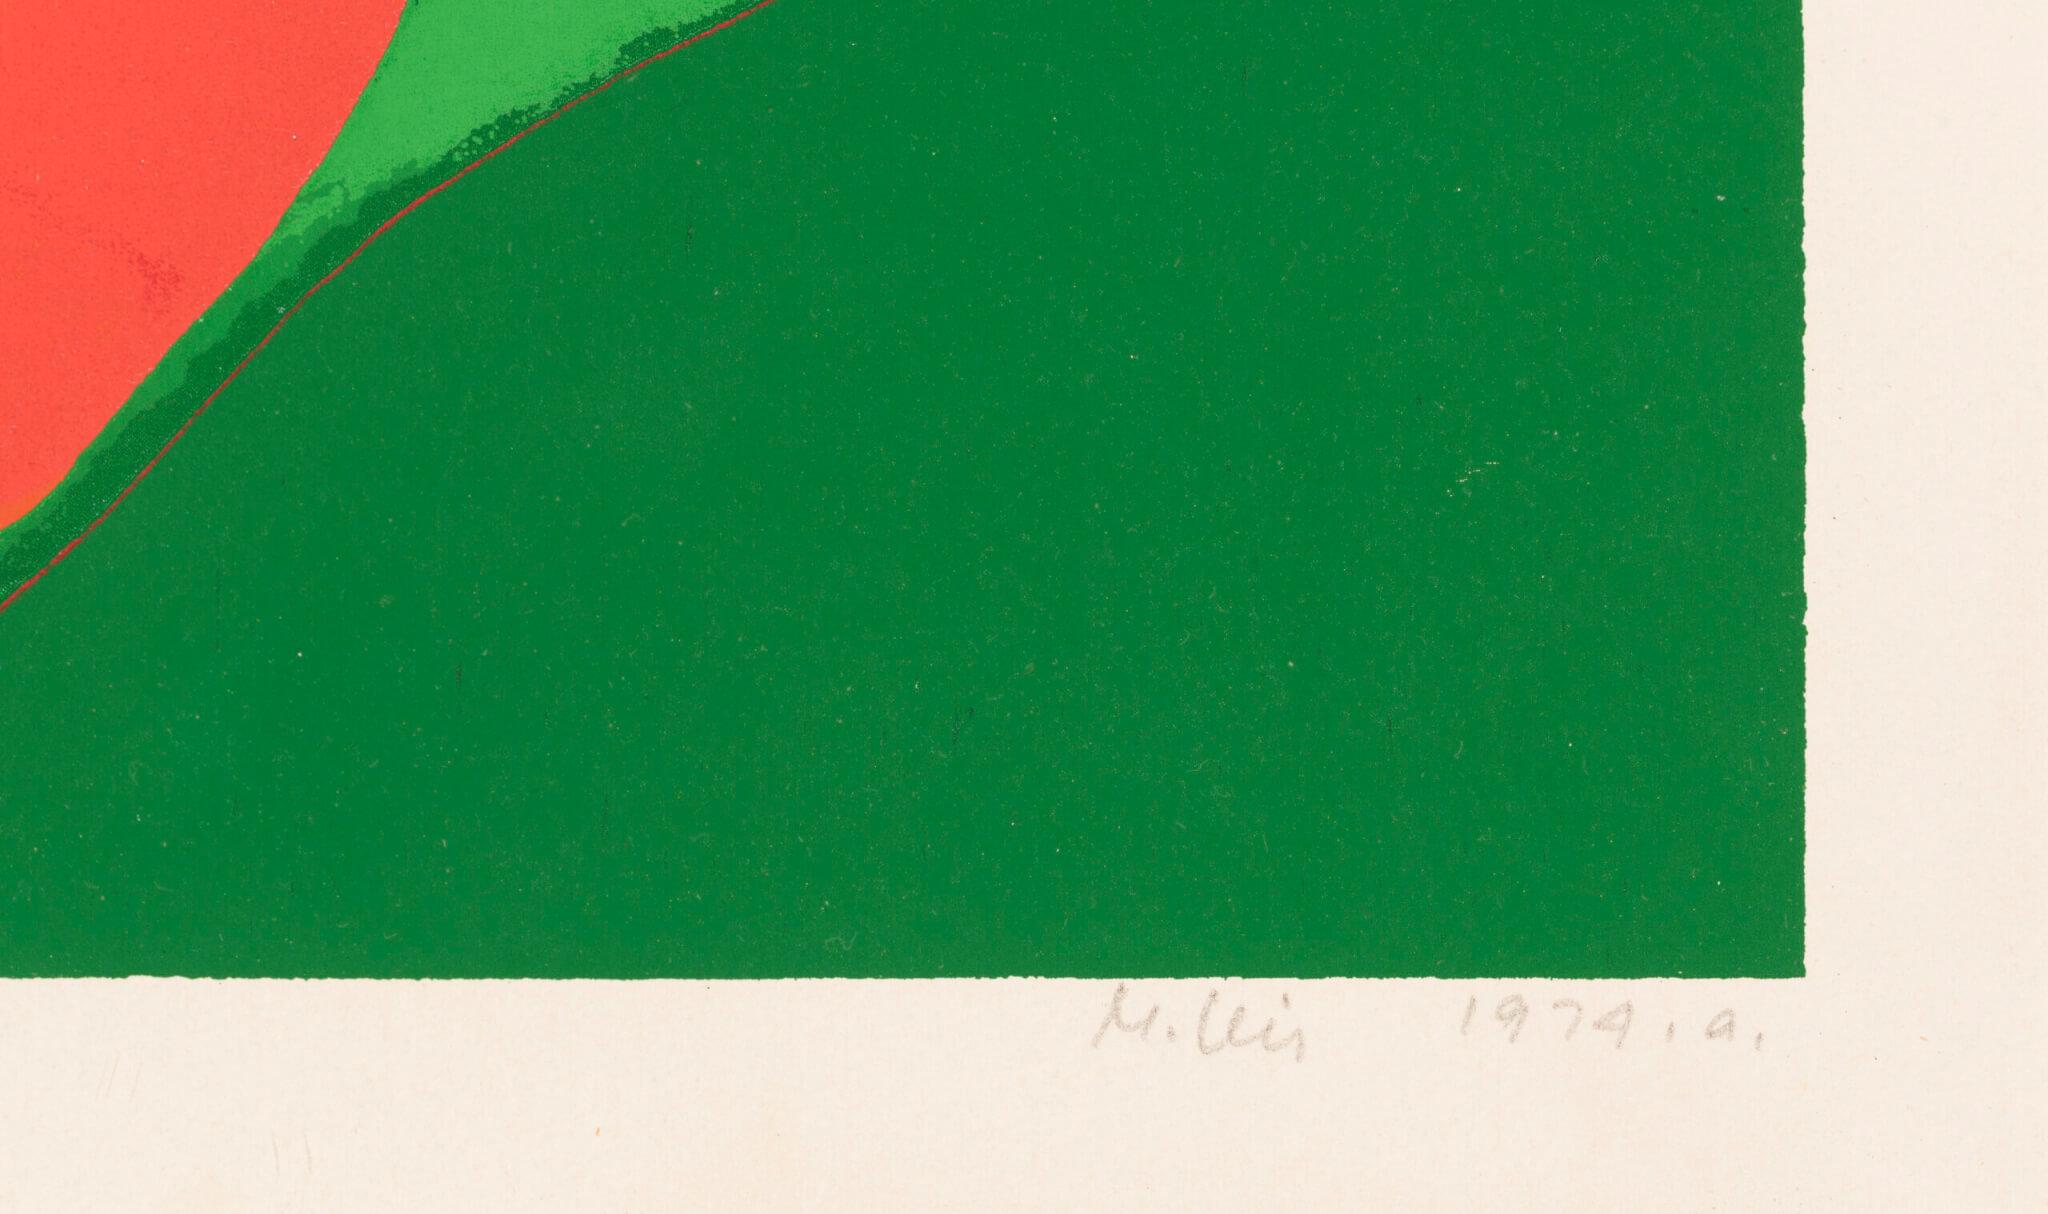 Malle-Leis-Lilled-XXII-signatuur